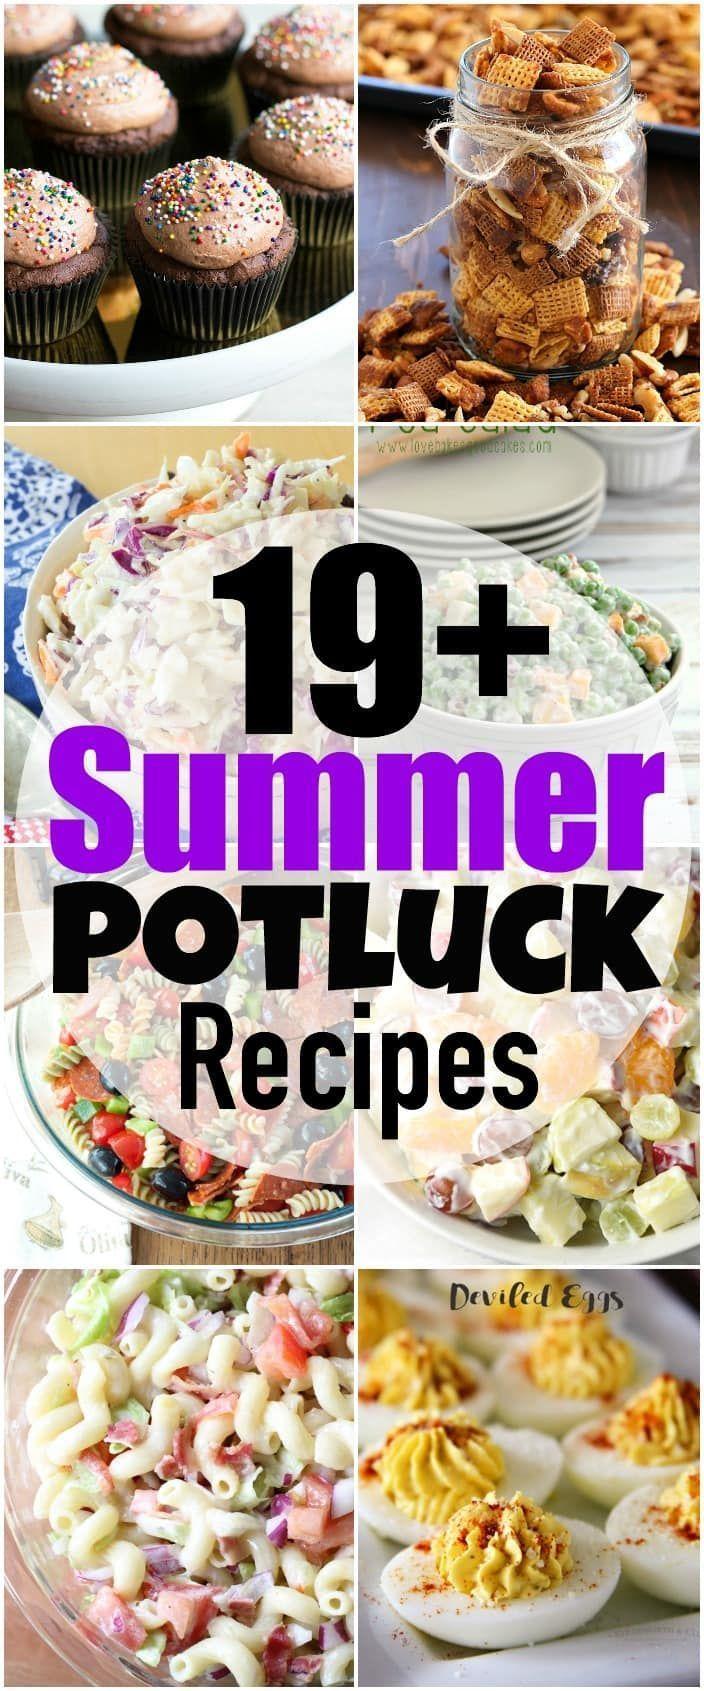 19+ Summer Potluck Recipes